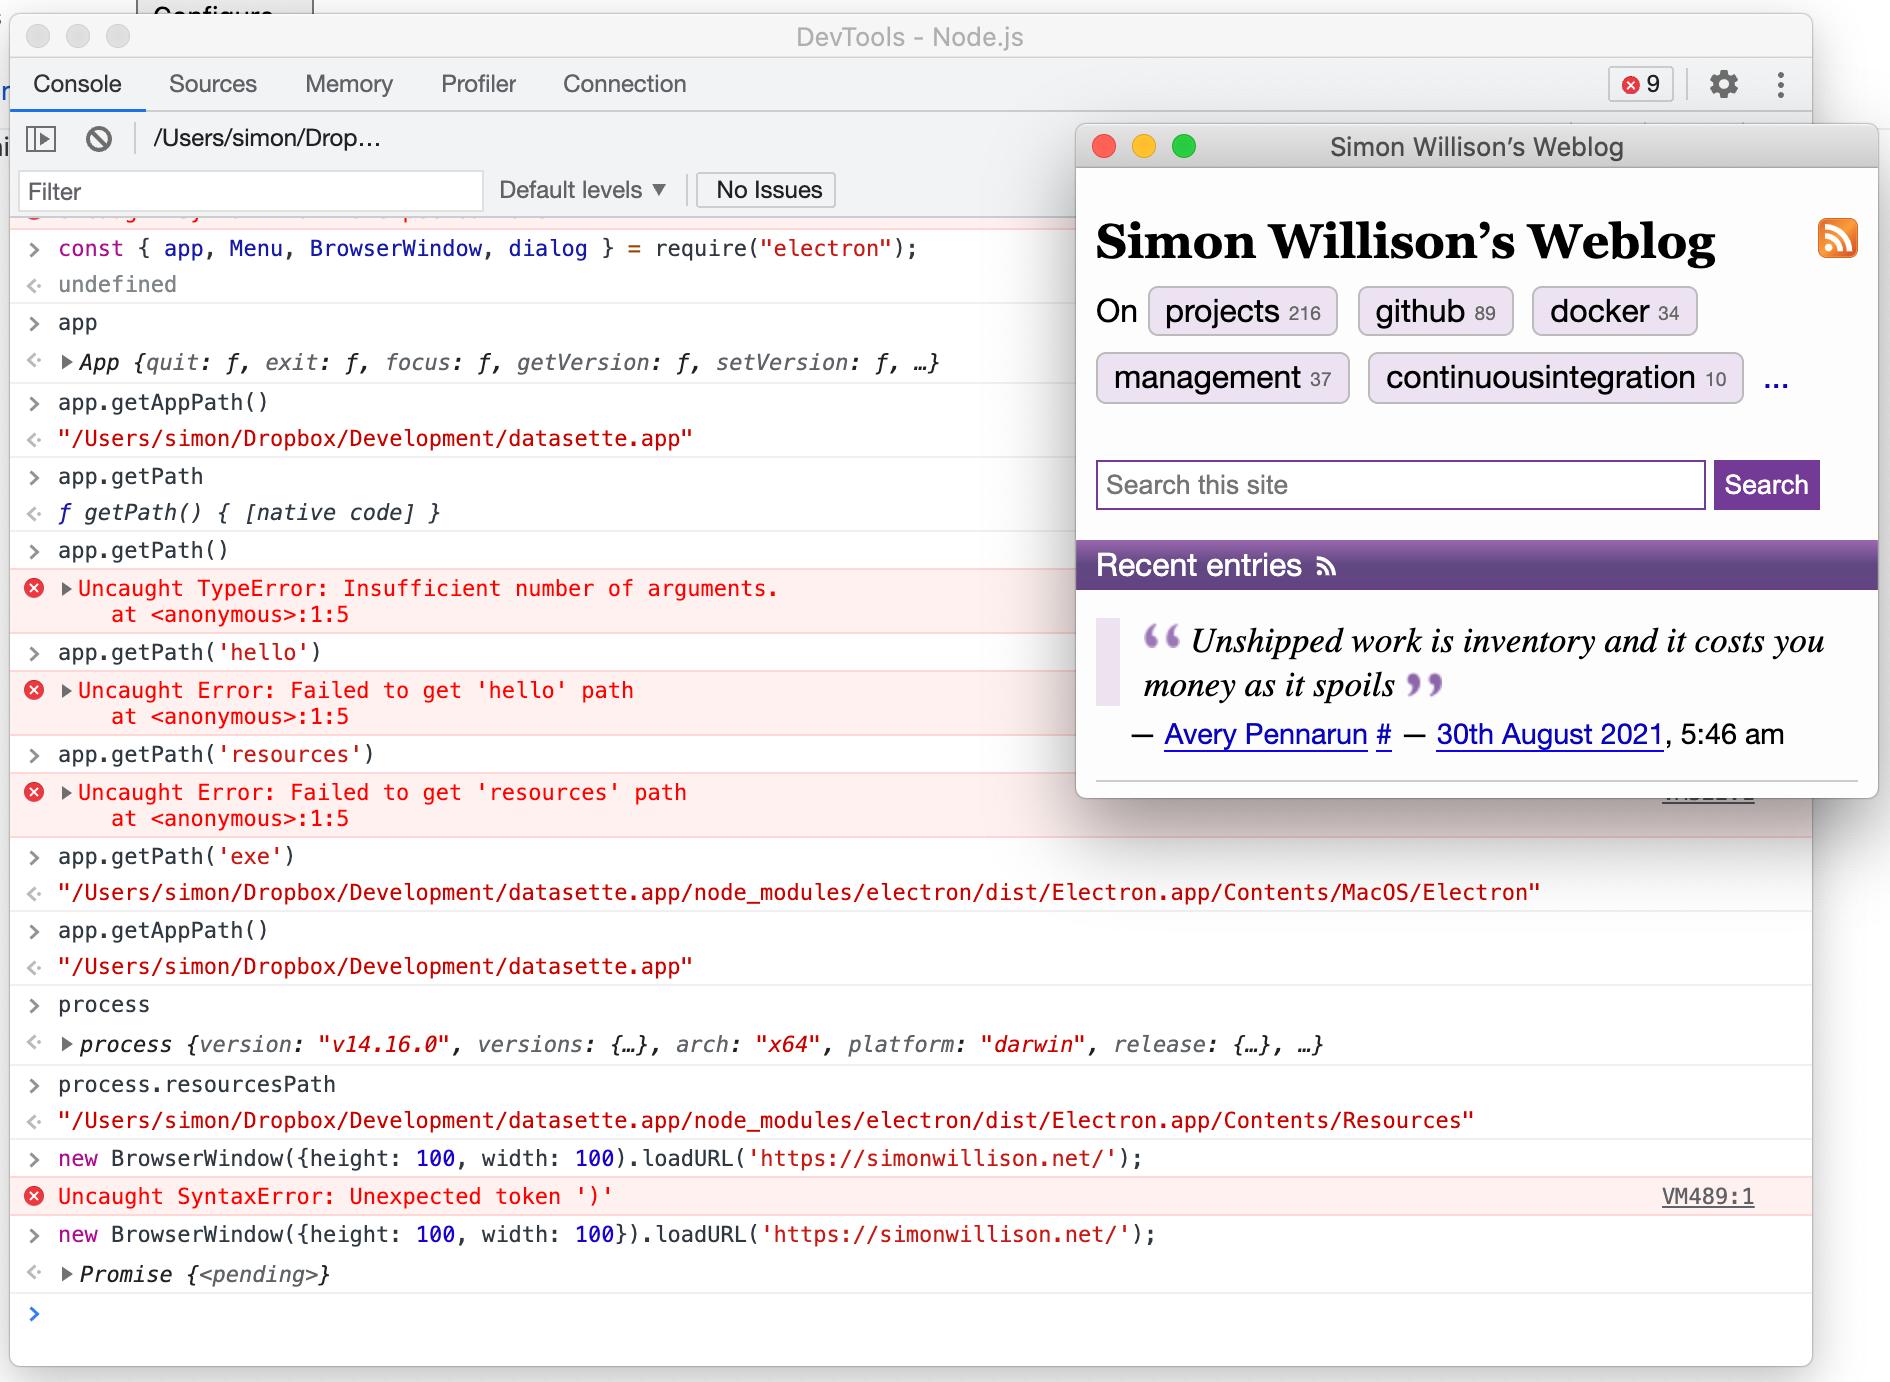 Simon_Willison's_Weblog_and_DevTools_-_Node_js_and_Inspect_with_Chrome_Developer_Tools